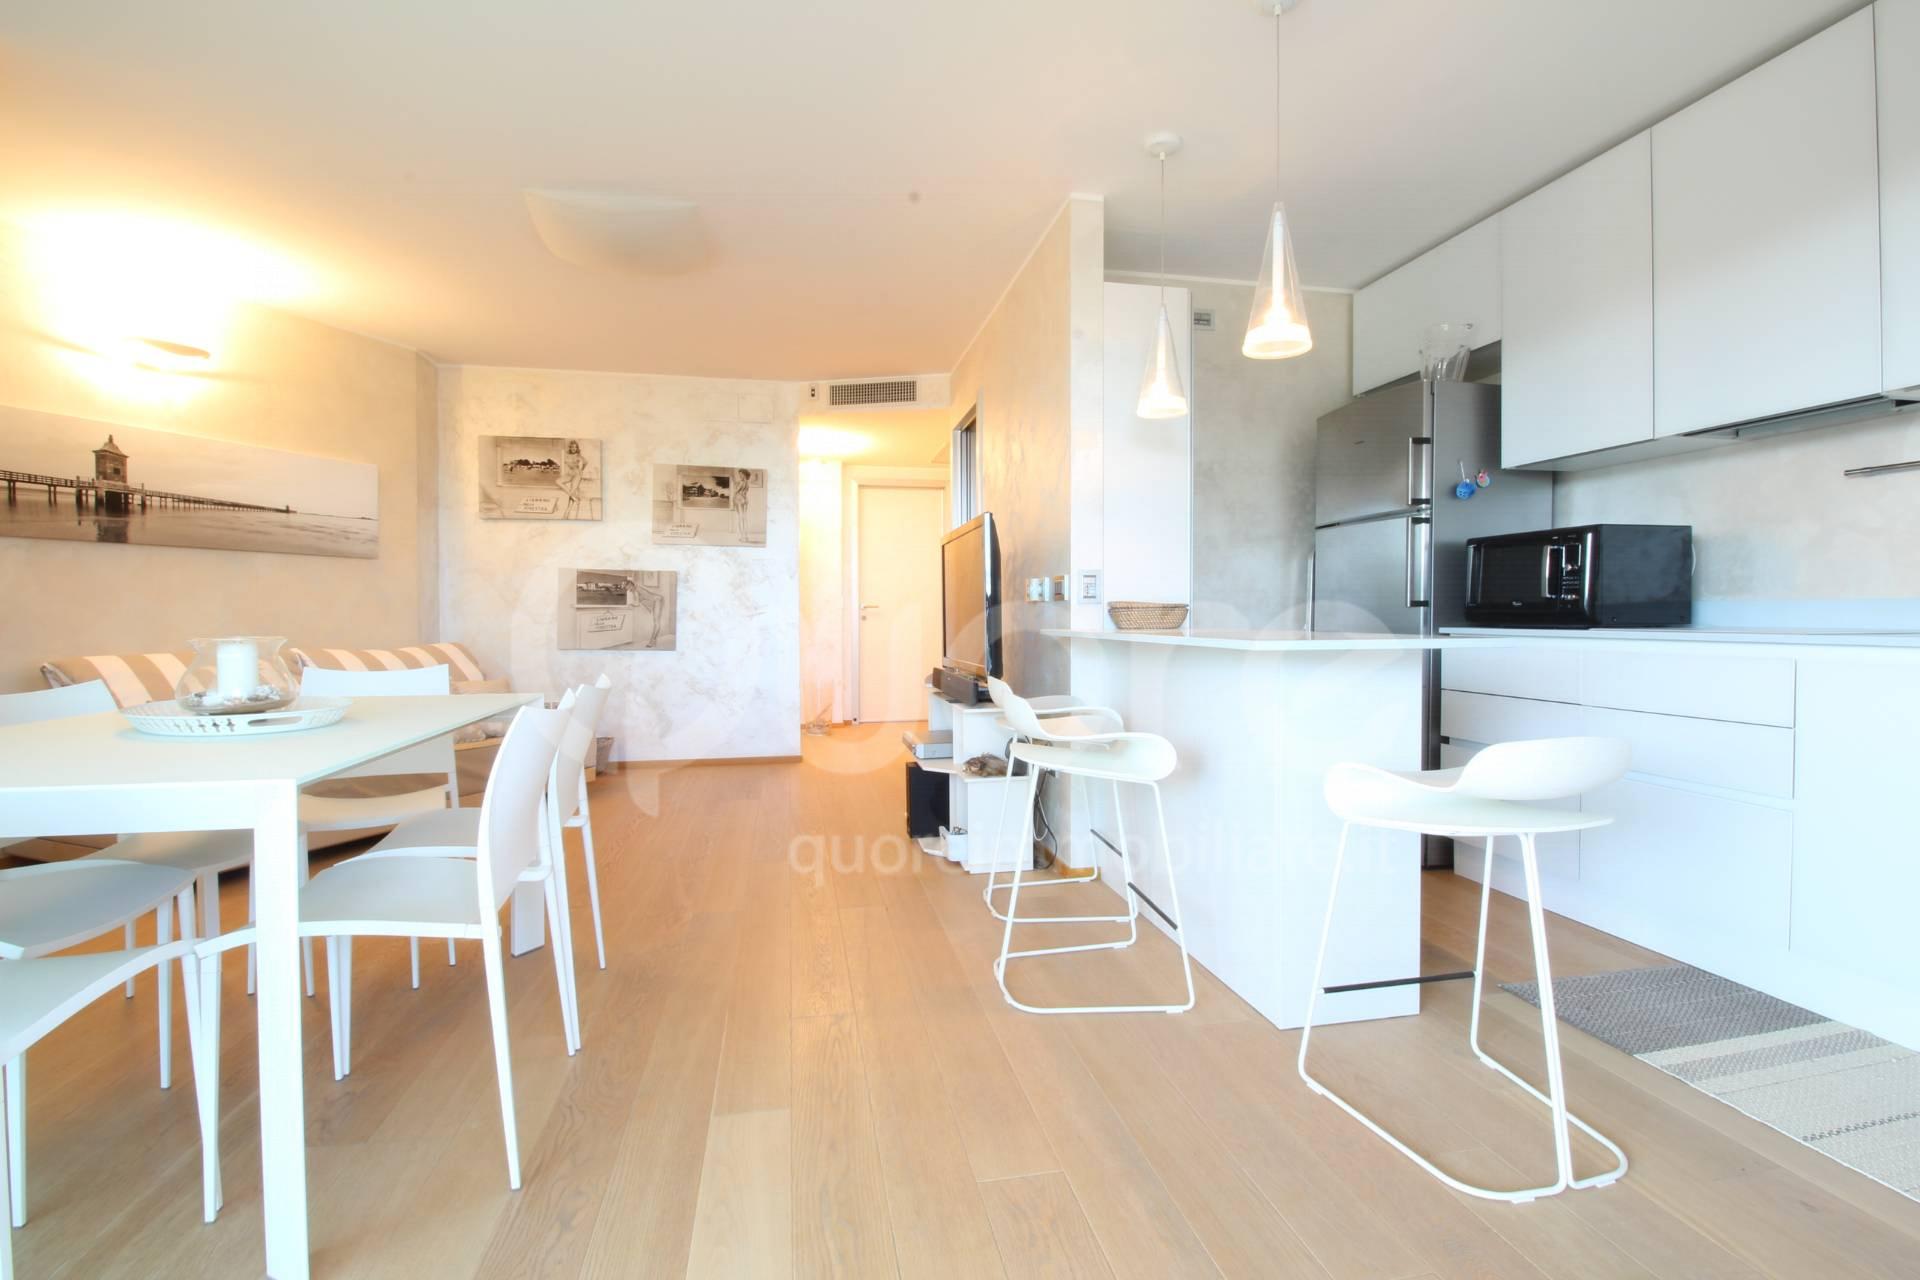 Appartamento A Lignano Sabbiadoro Cod Lm245